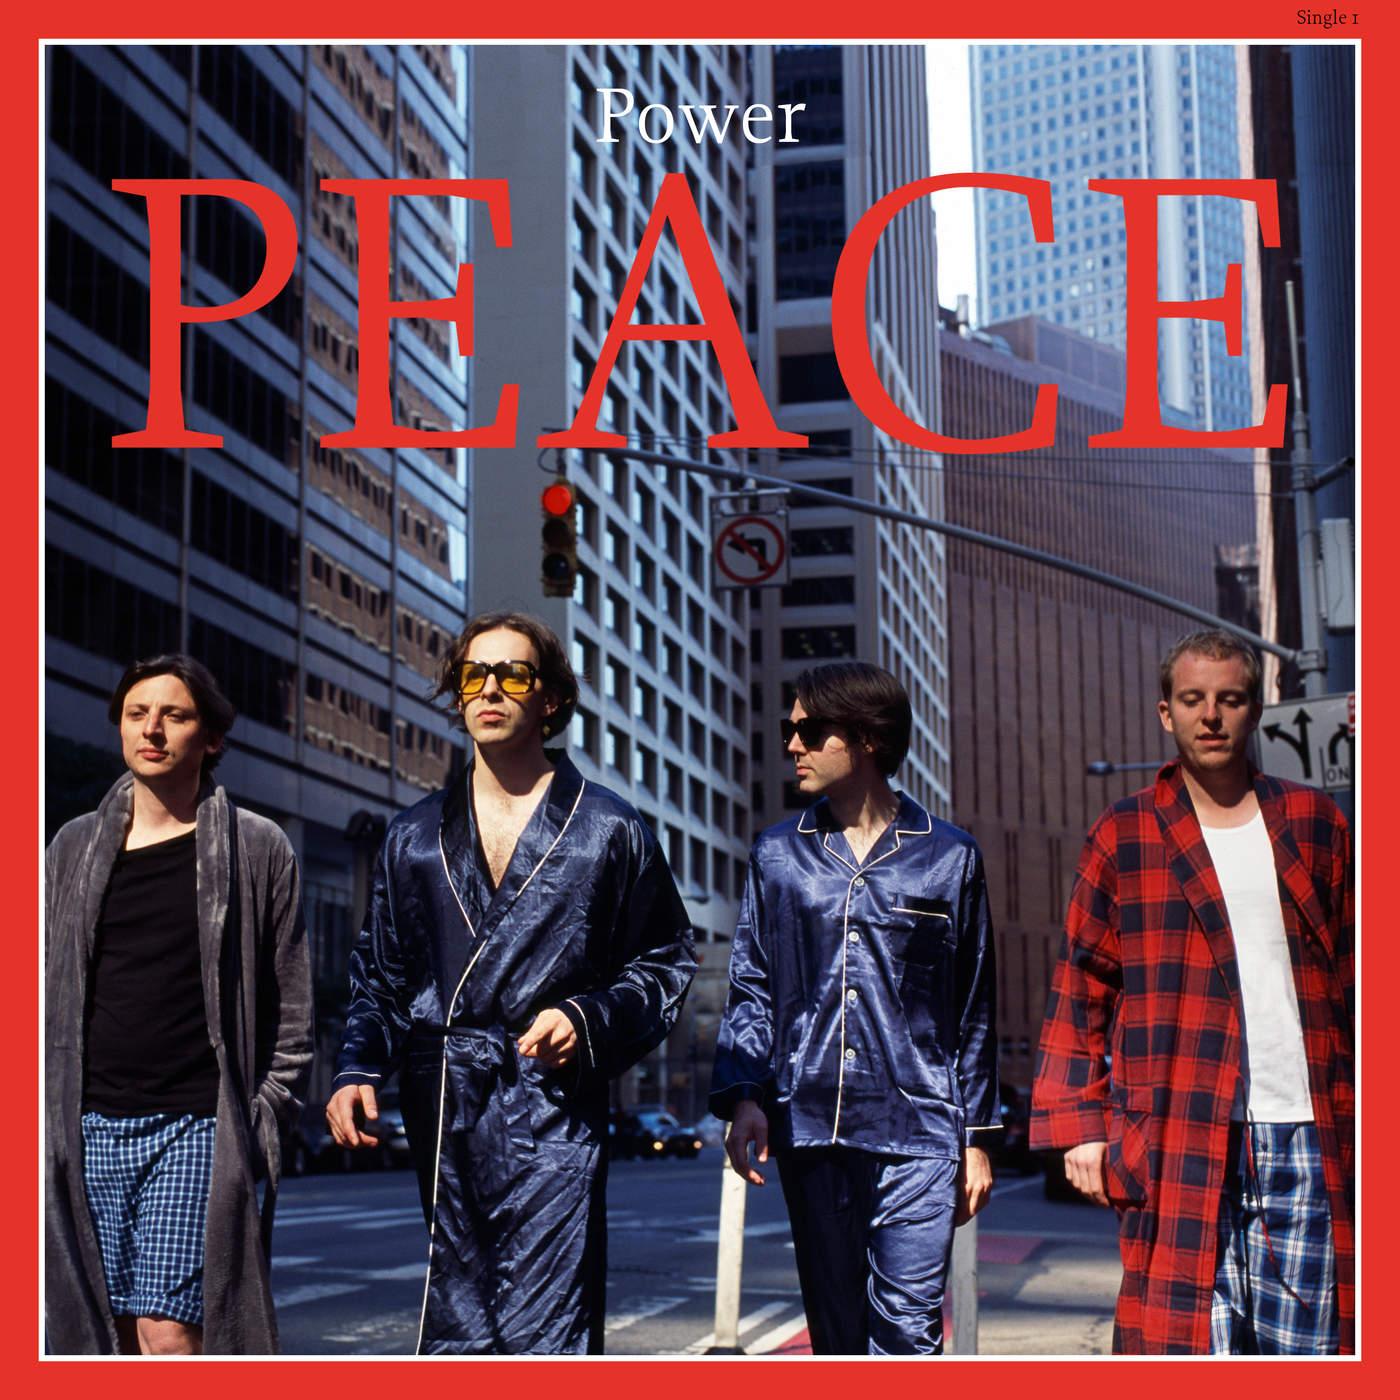 Peace - Power